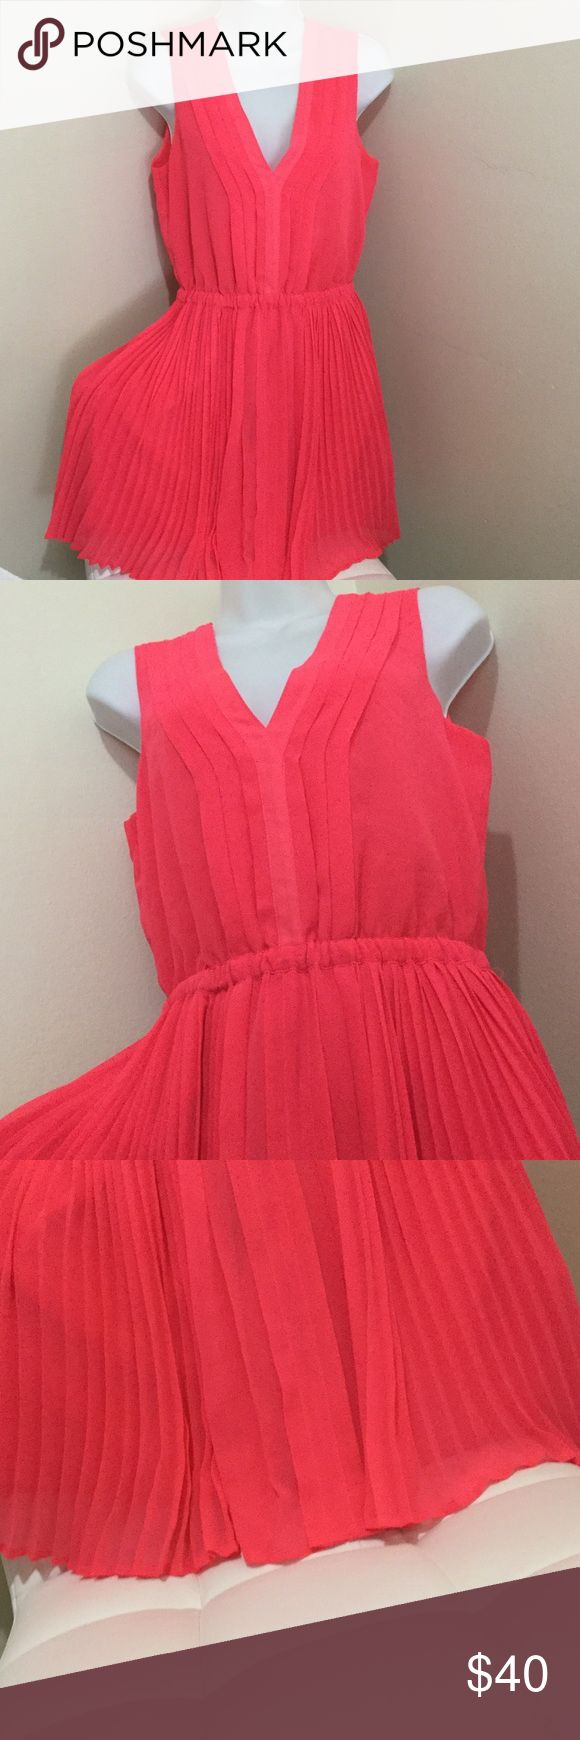 Victoria Secret Dress Pre owed Small I only Wore these ones... Super Cute 😘💓💓😊 Retail $99 Victoria's Secret Dresses Midi